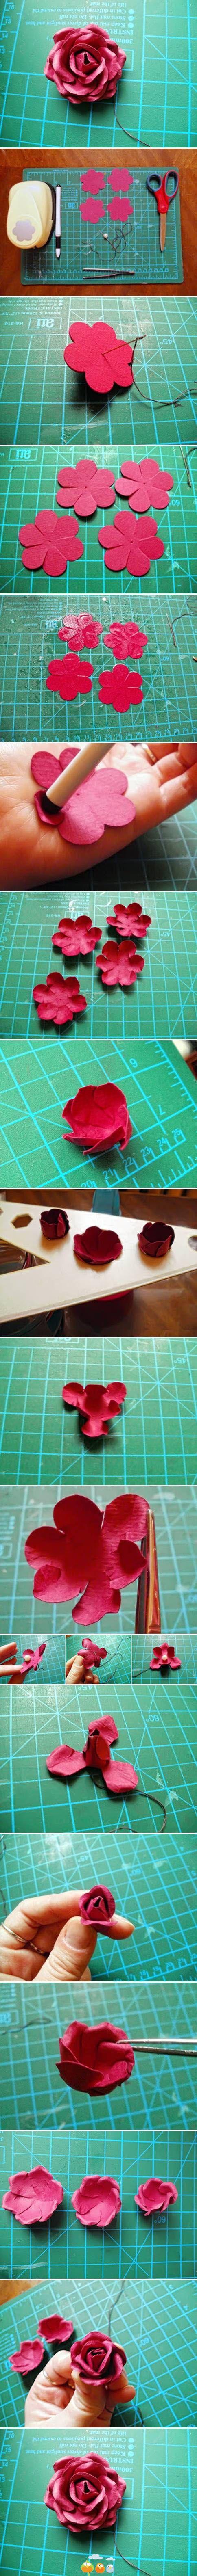 Inspirational Monday - Do it yourself (diy) Flower series - DIY paper rose flower